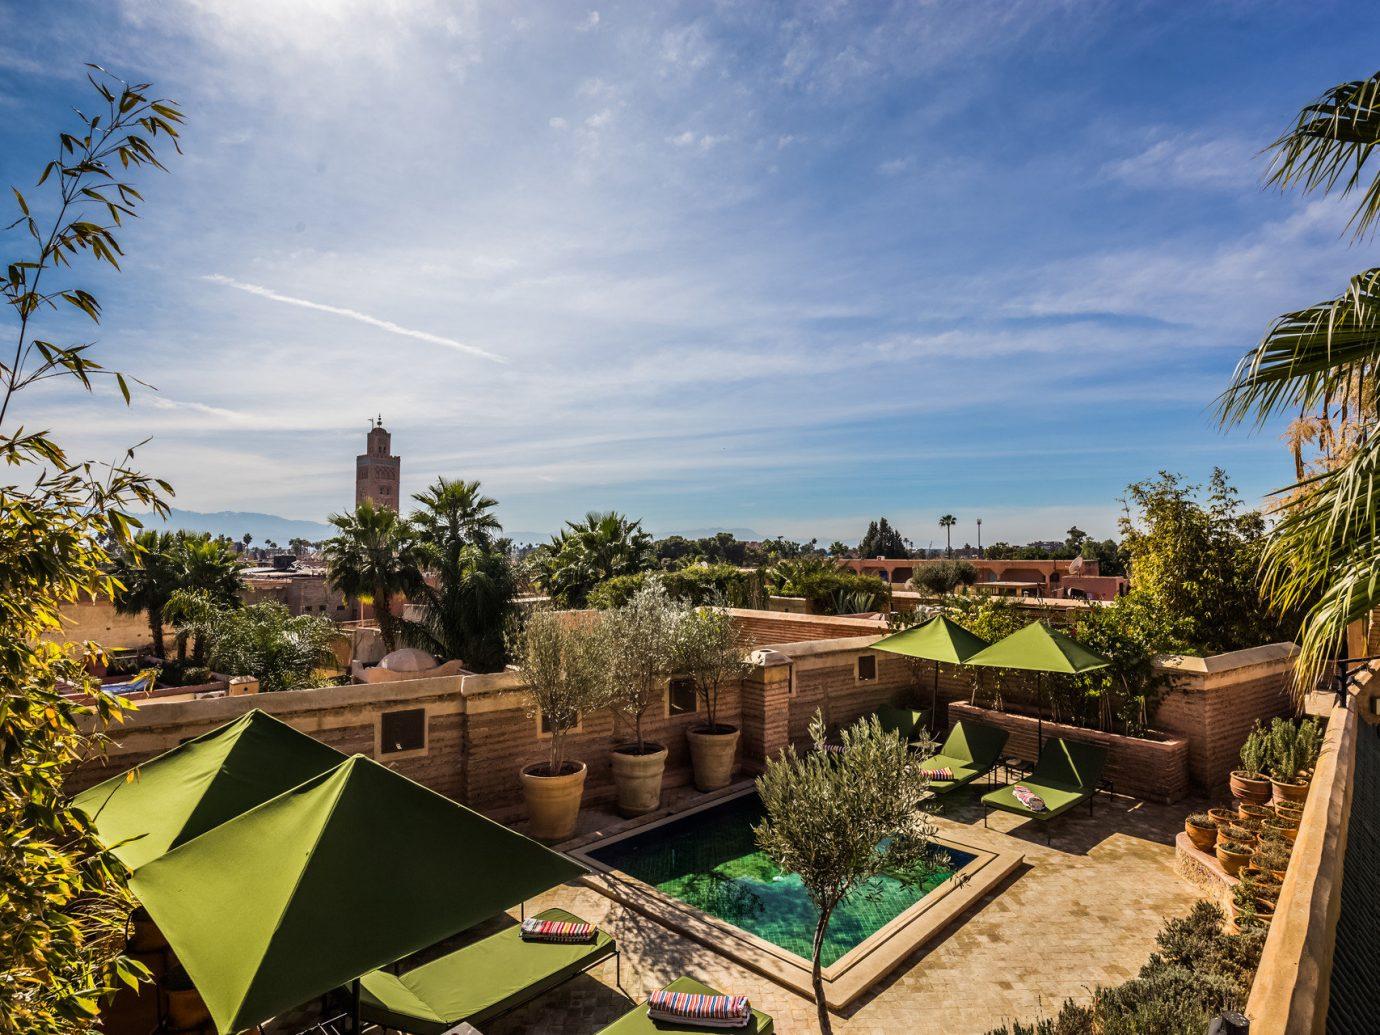 Hotels tree sky outdoor property Resort estate vacation arecales plant Garden Villa palm